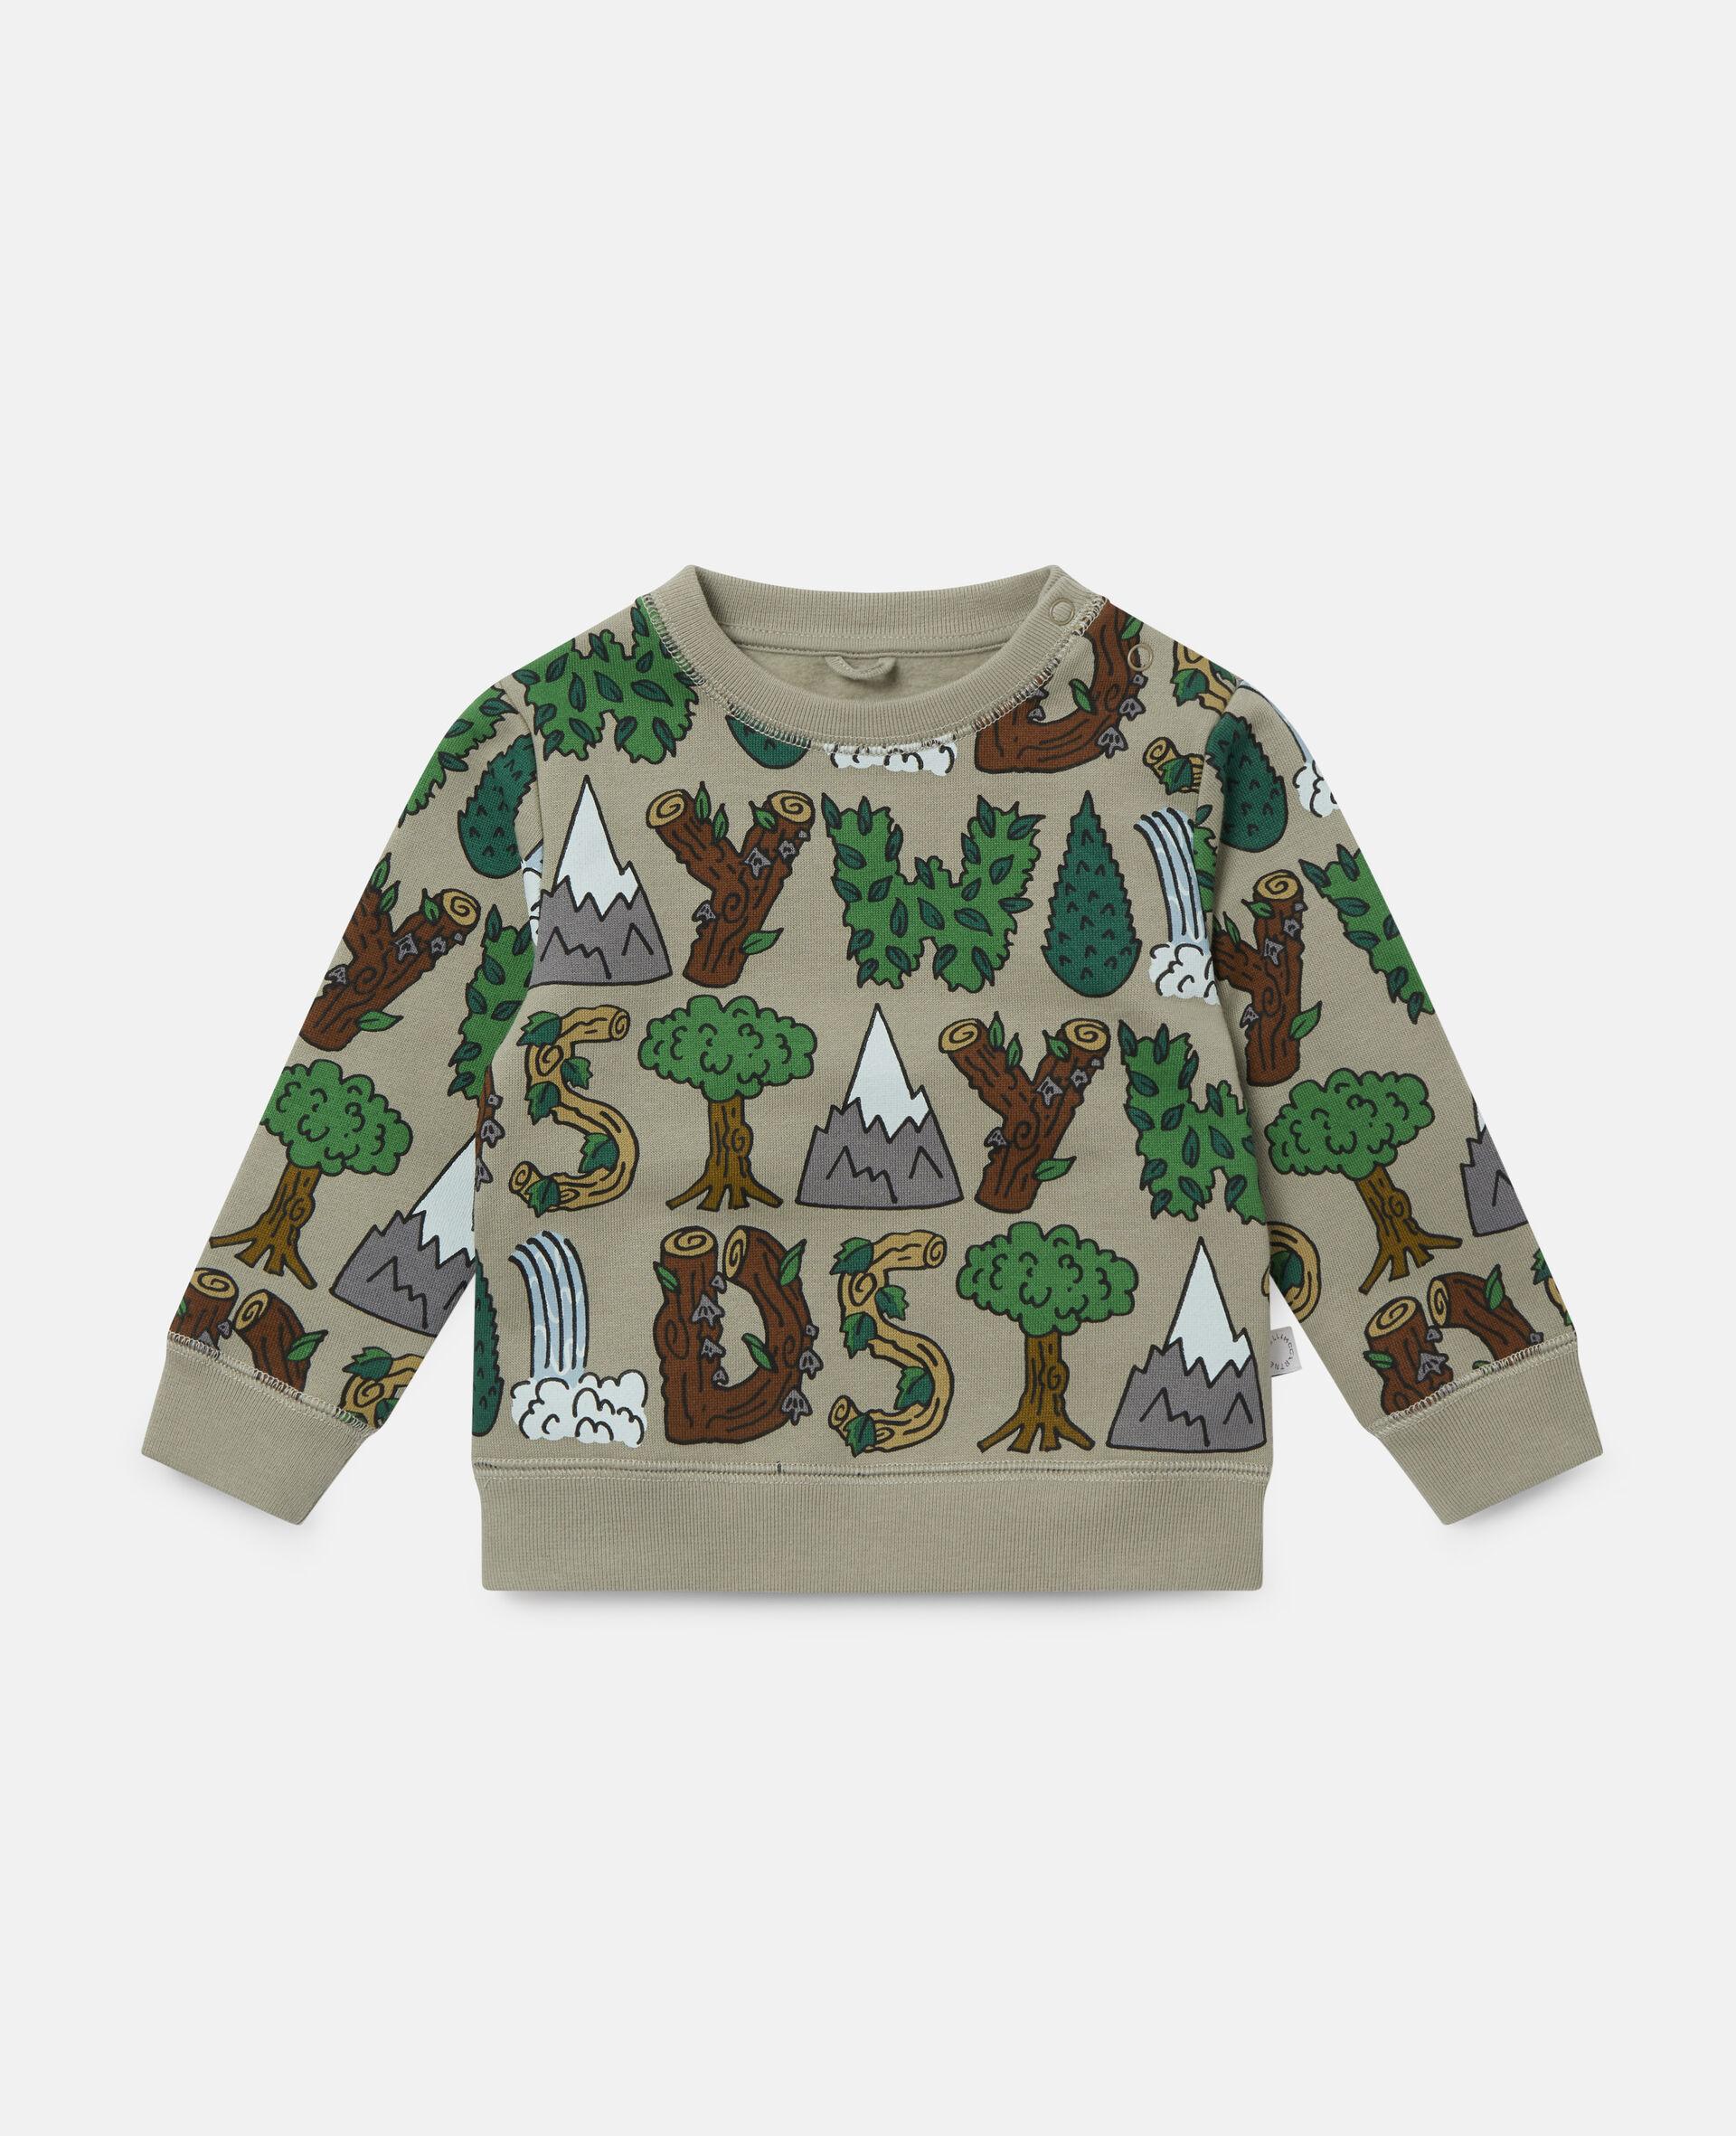 Stay Wild' Fleece Sweatshirt-Green-large image number 0